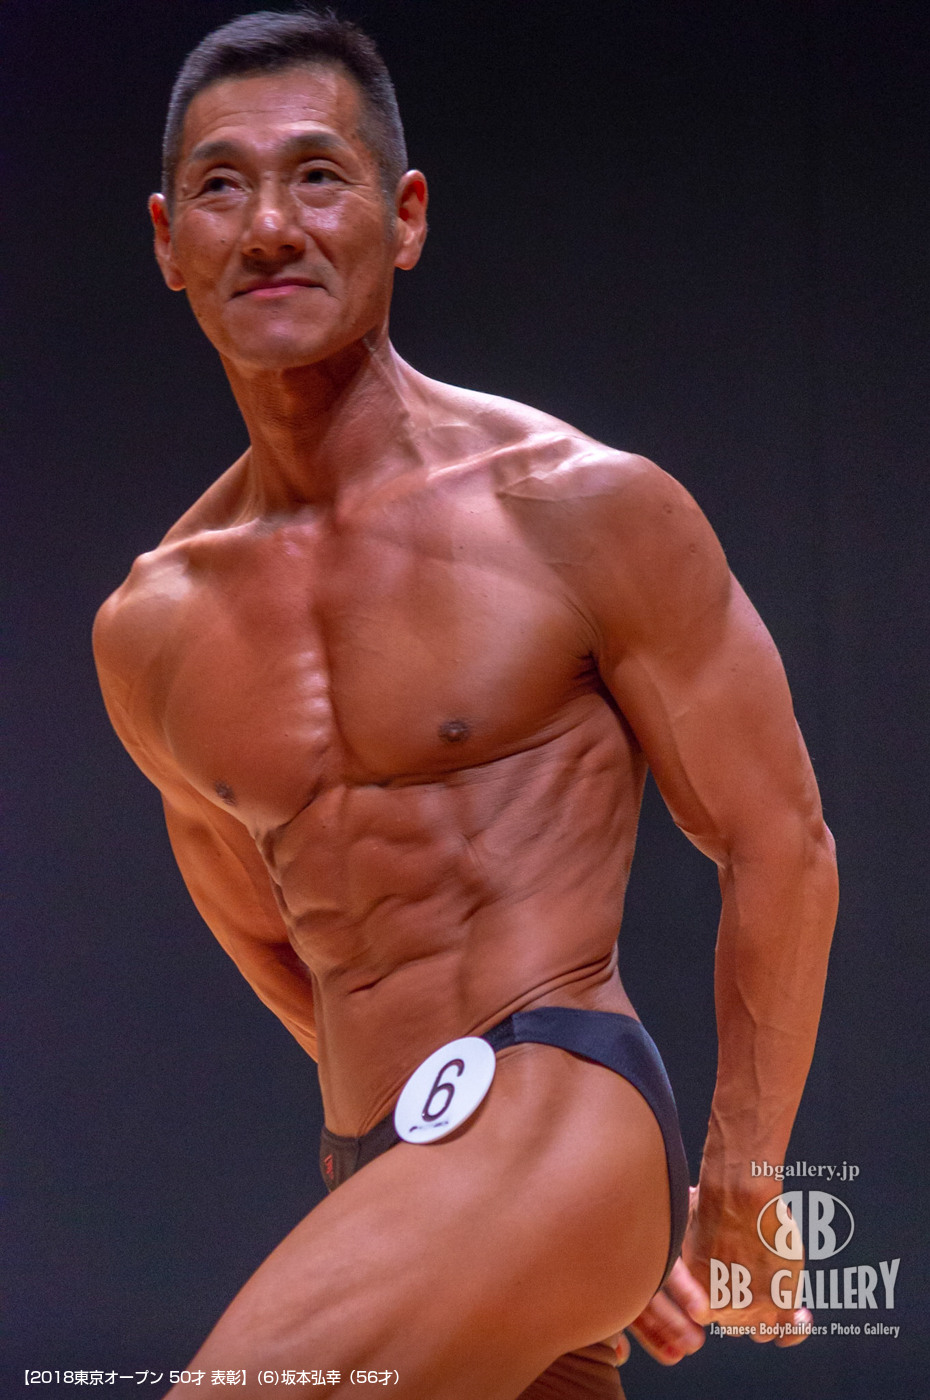 【2018東京オープン 50才 表彰】(6)坂本弘幸(56才)